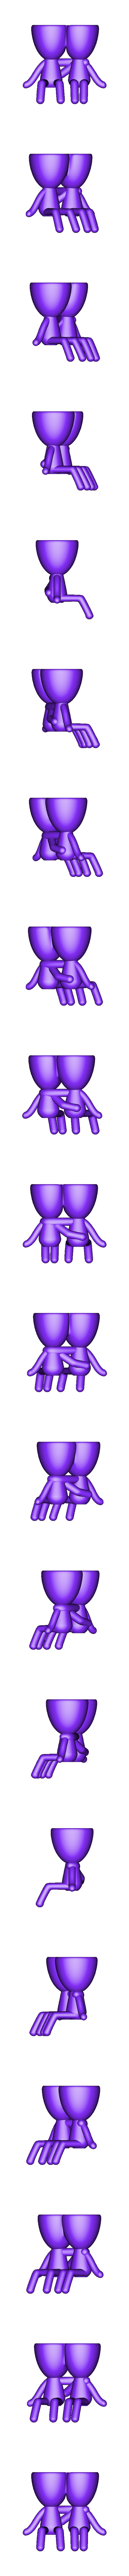 Enamorados 2.stl Download free STL file Florero Maceta Robert N° 2 VASE FLOWERPOT ROBERT IN LOVE • 3D printer object, PRODUSTL56